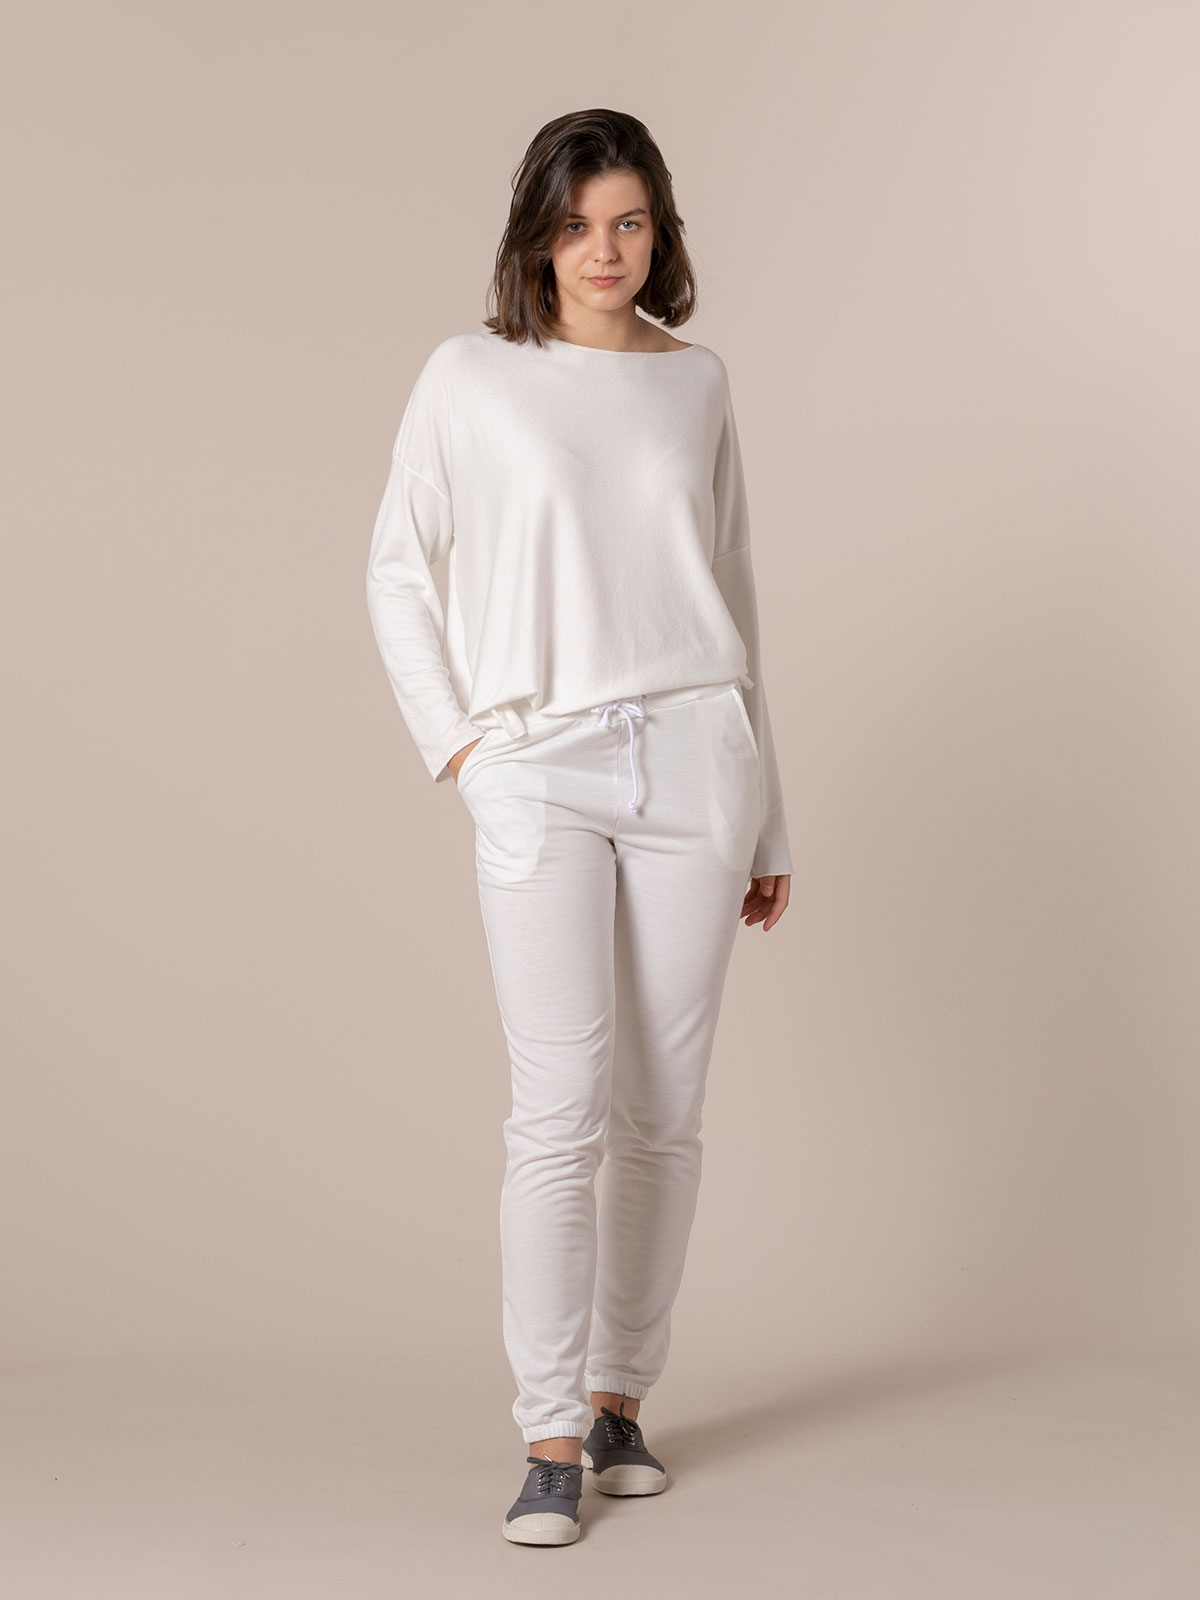 Pantalón mujer jogger detalle en bajo Blanco